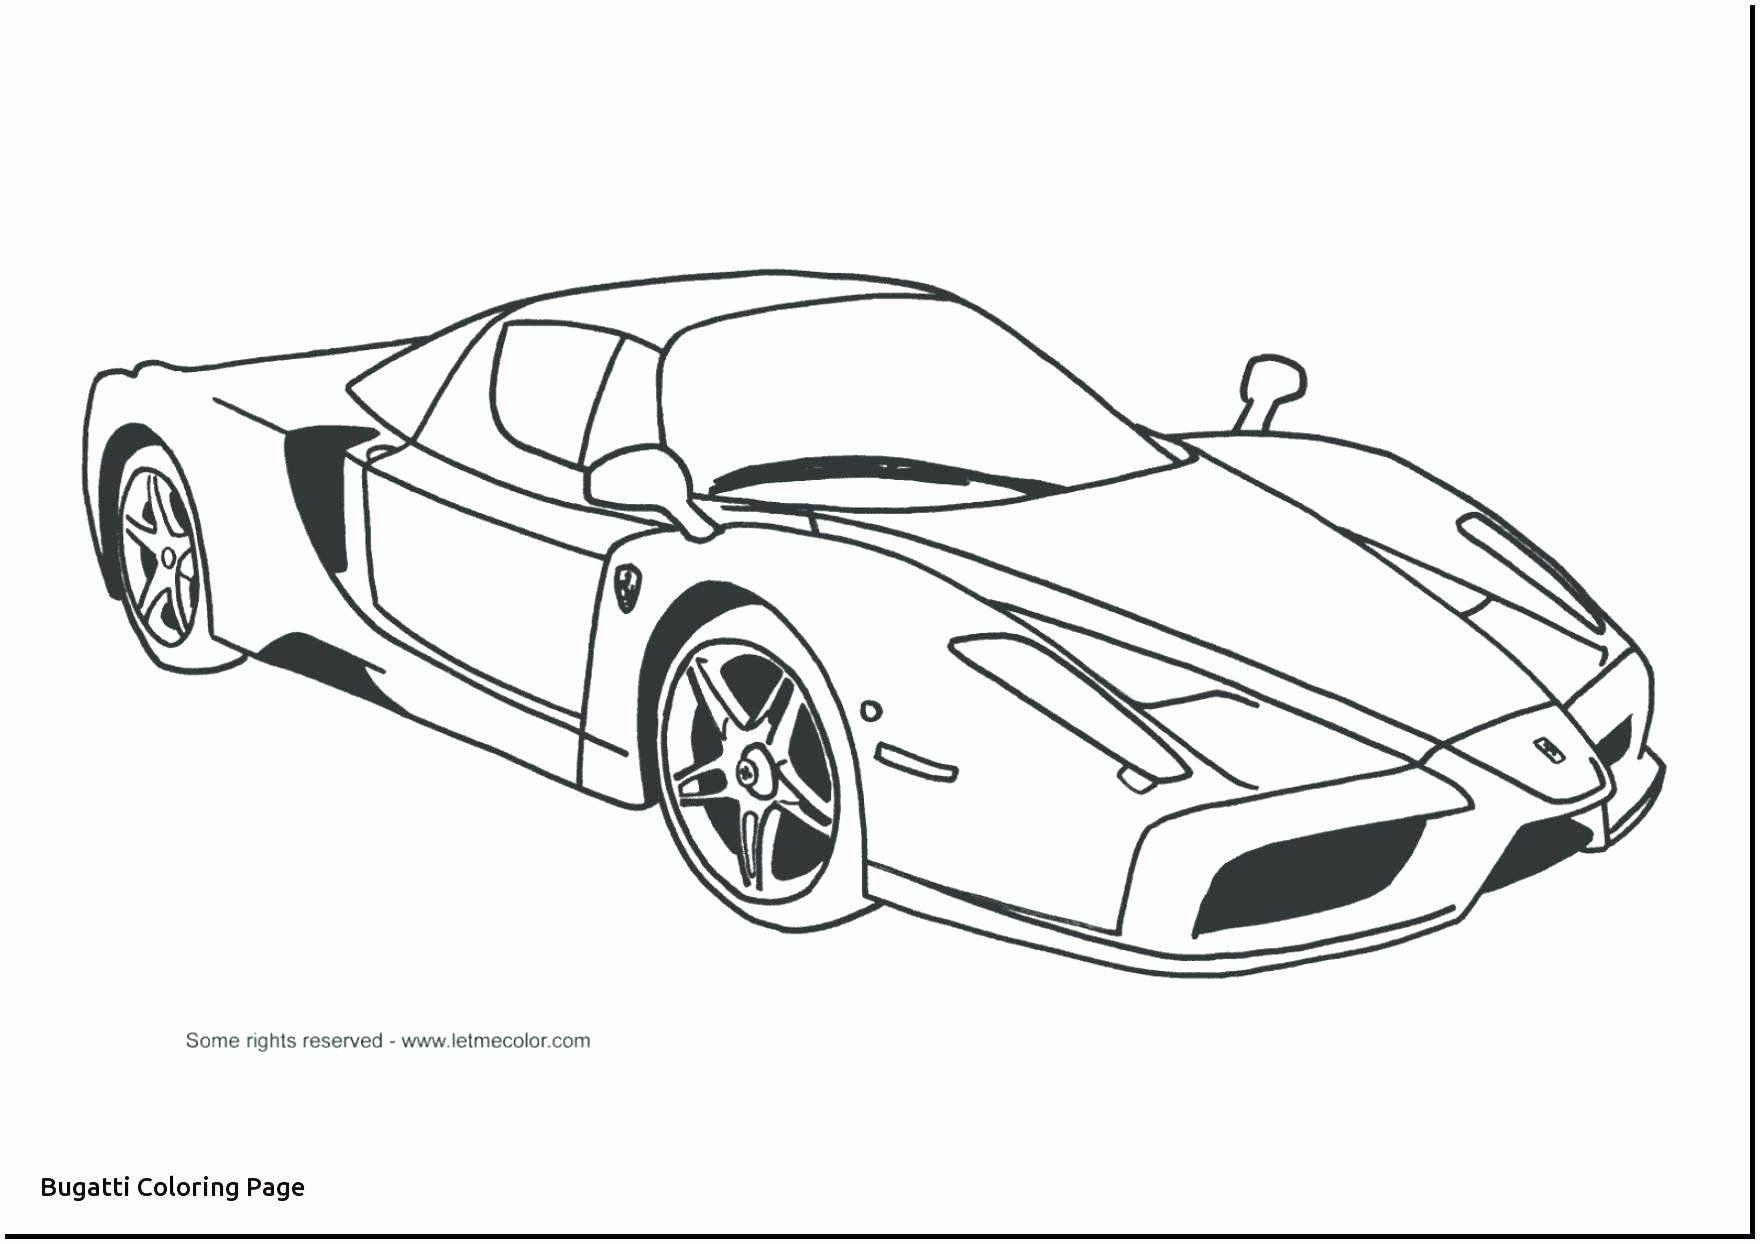 Range Rover Coloring Pages Best Of Lamborghini Coloring Page Disney Honda Civic Montana